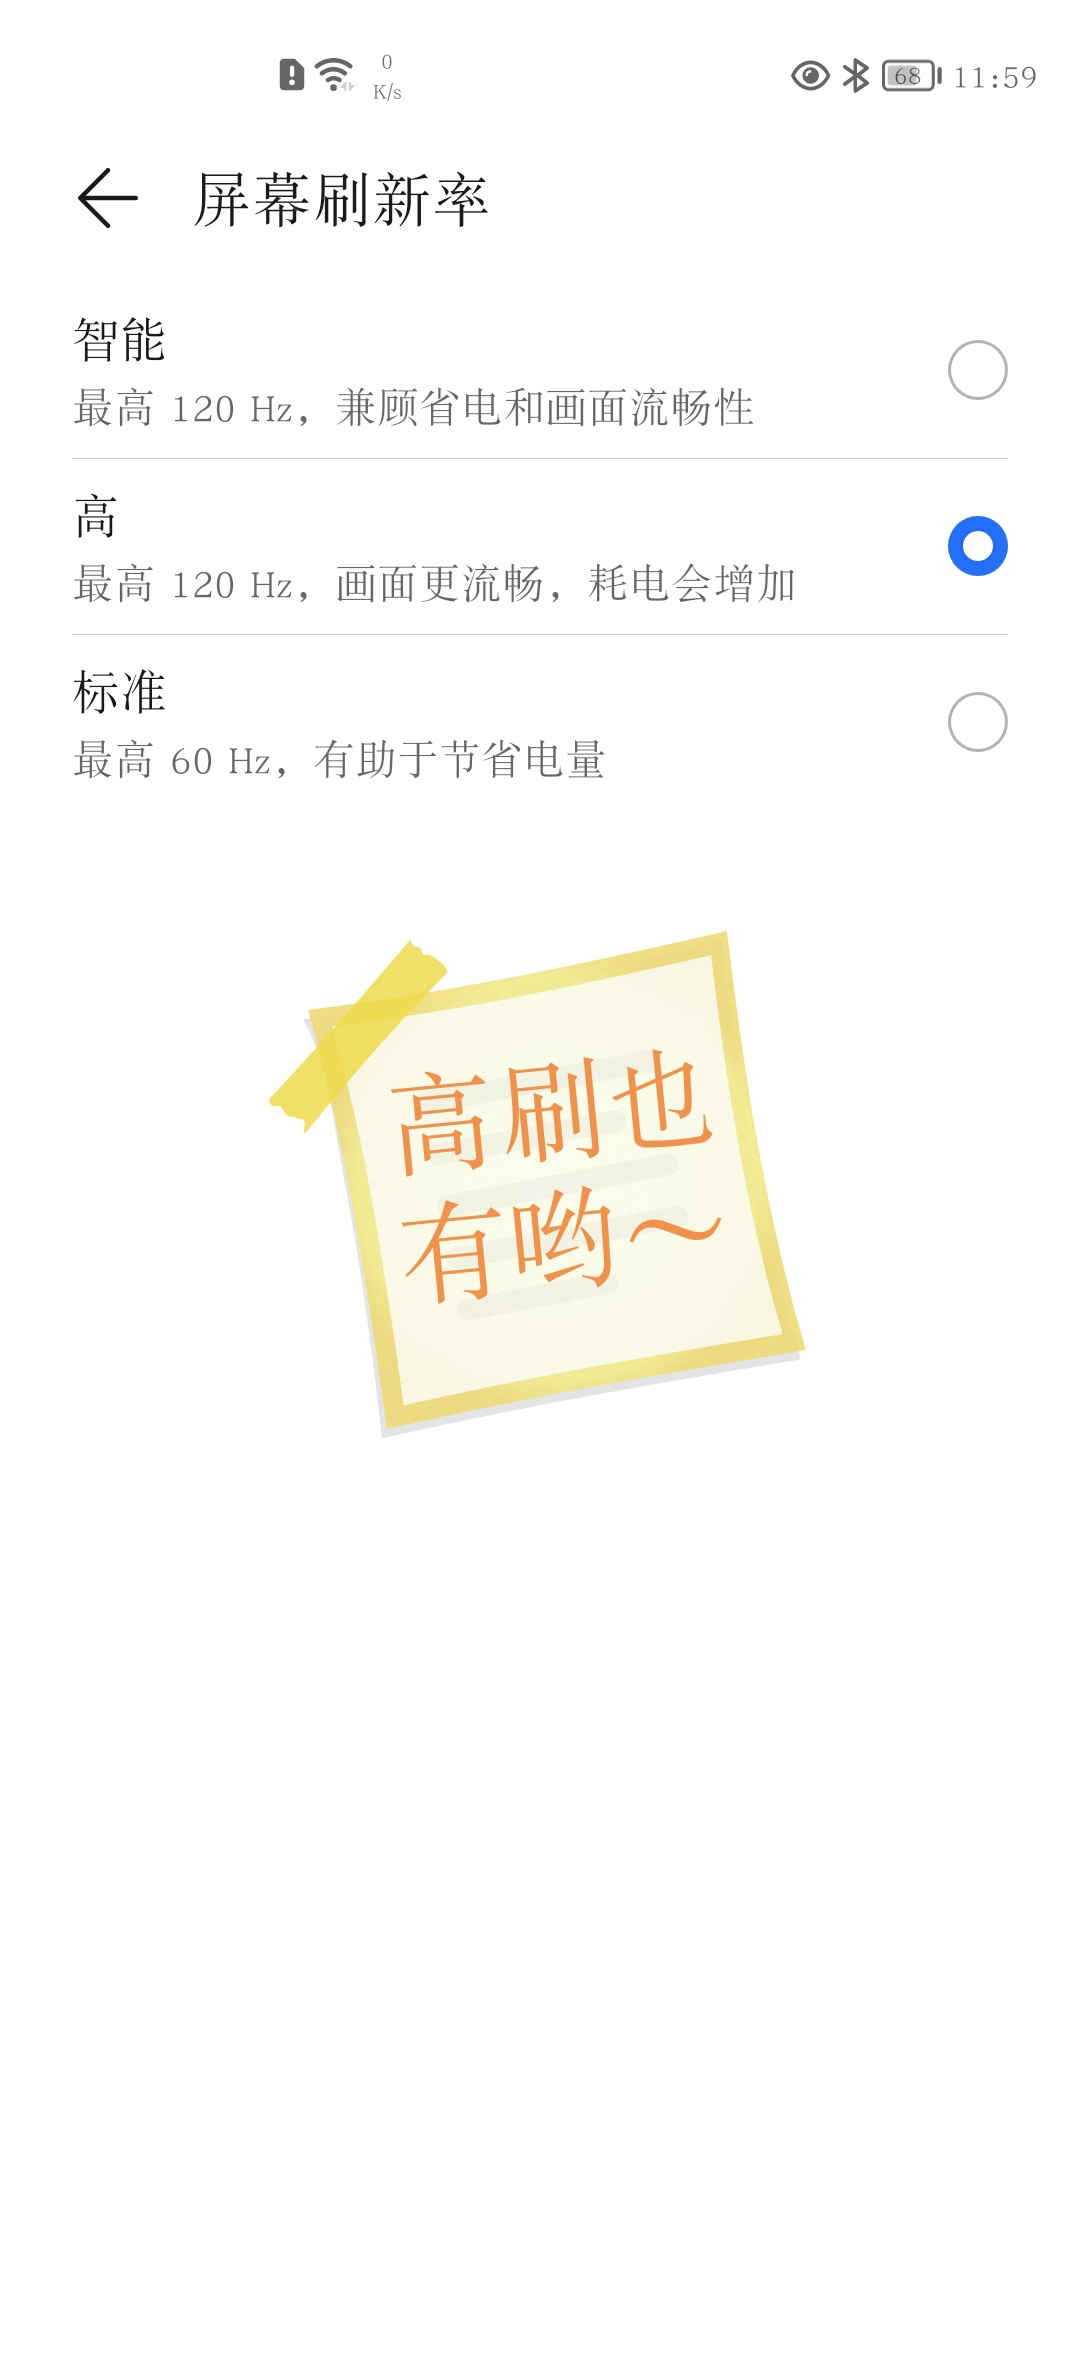 Screenshot_20210923_115957_edit_279437271751116.jpg